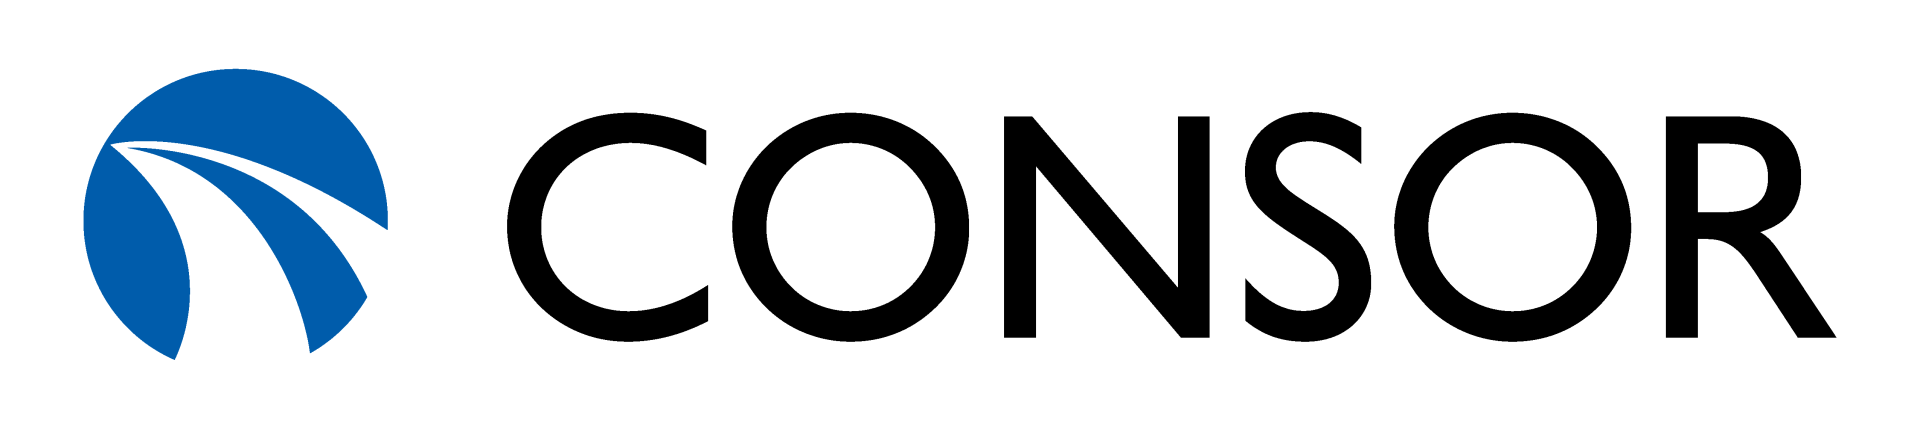 Consor Logo